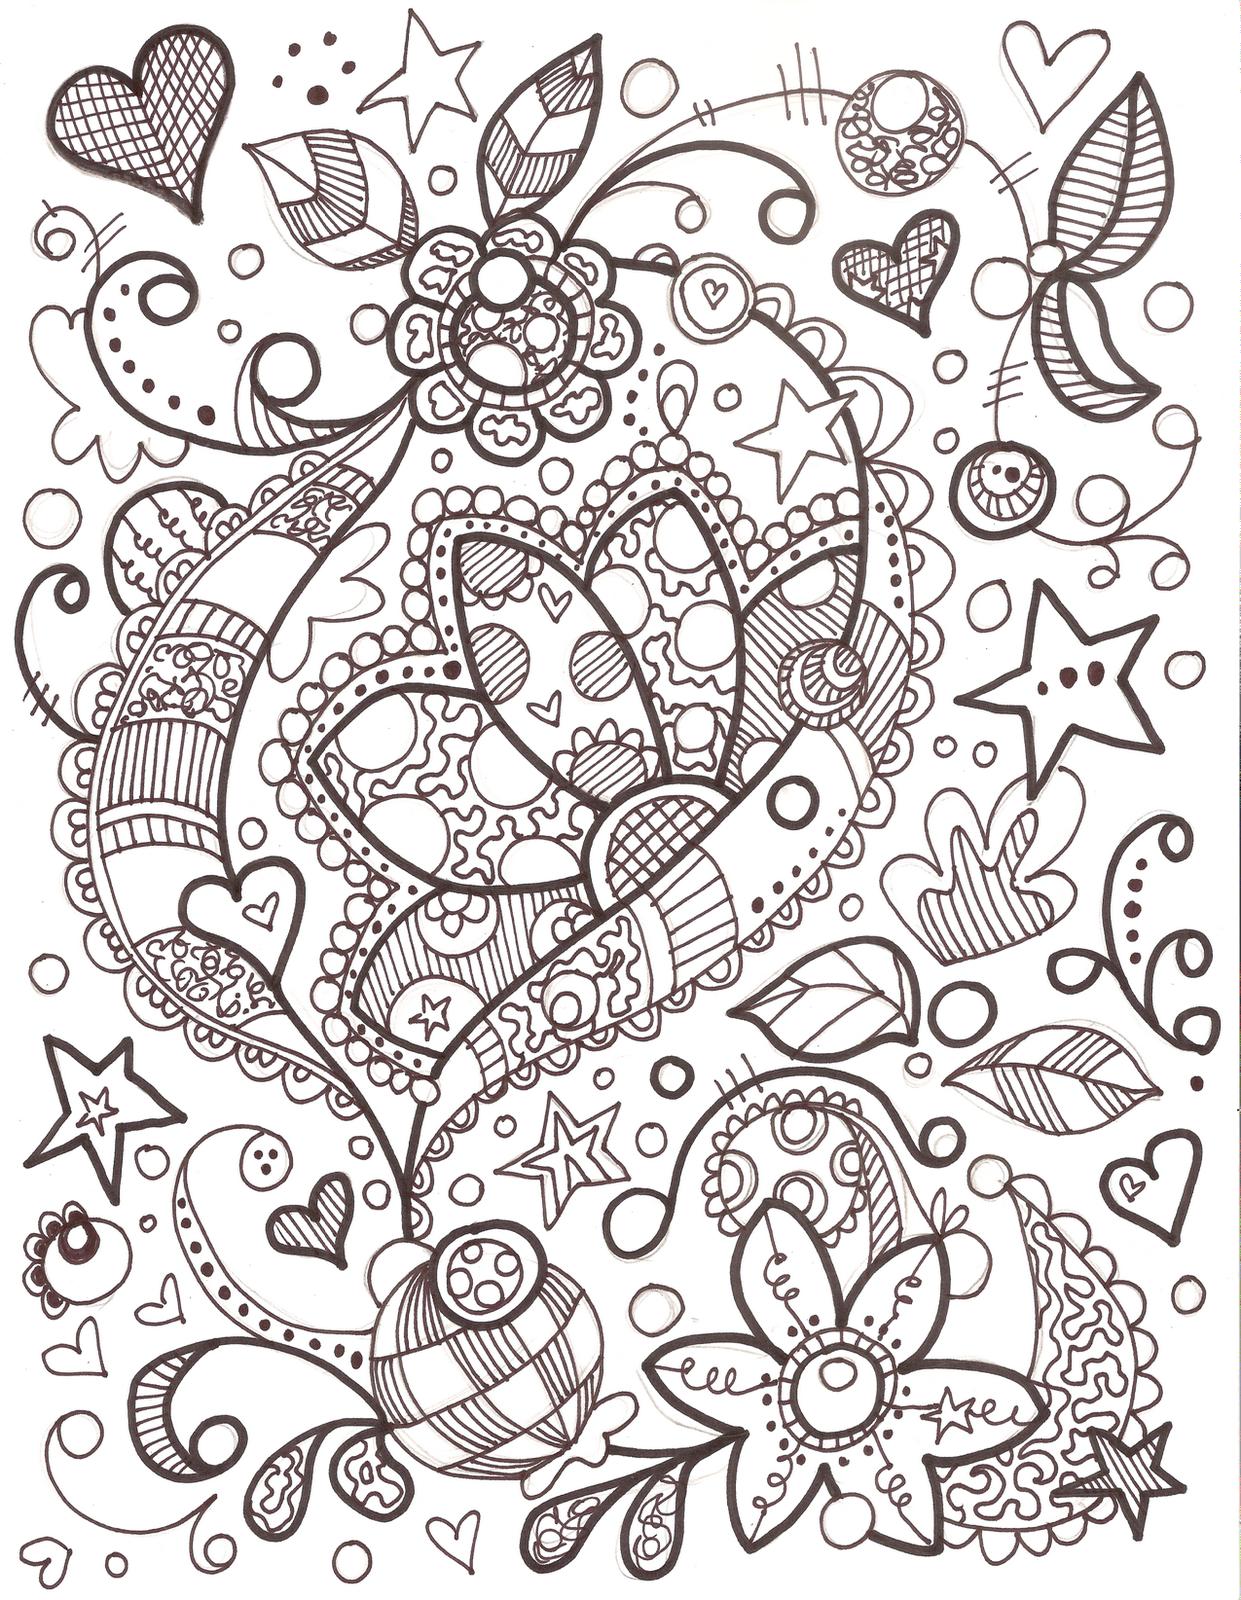 Pin By Gueli Weli Weli On Doodles Sharpie Doodles Doodle Coloring Flower Doodles